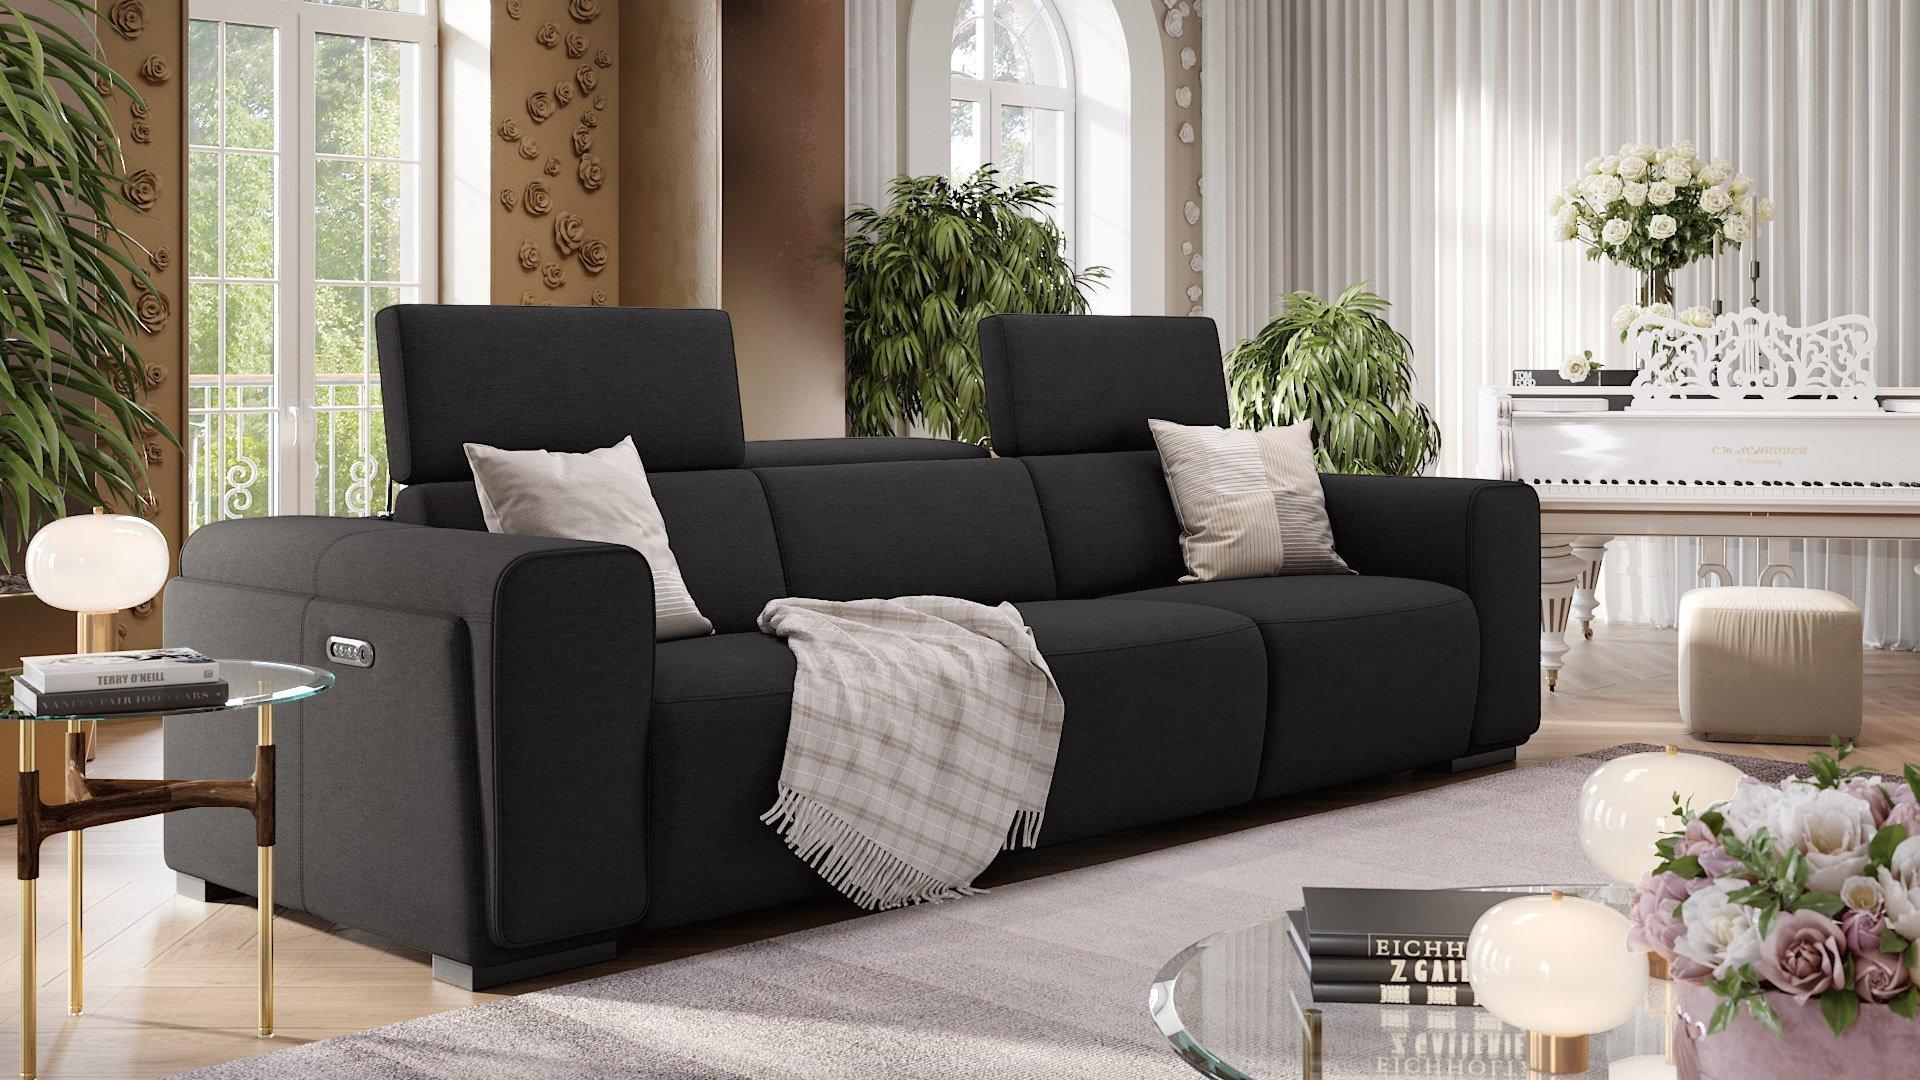 Stoff 3-Sitzer Sofa XXL IMPERIA